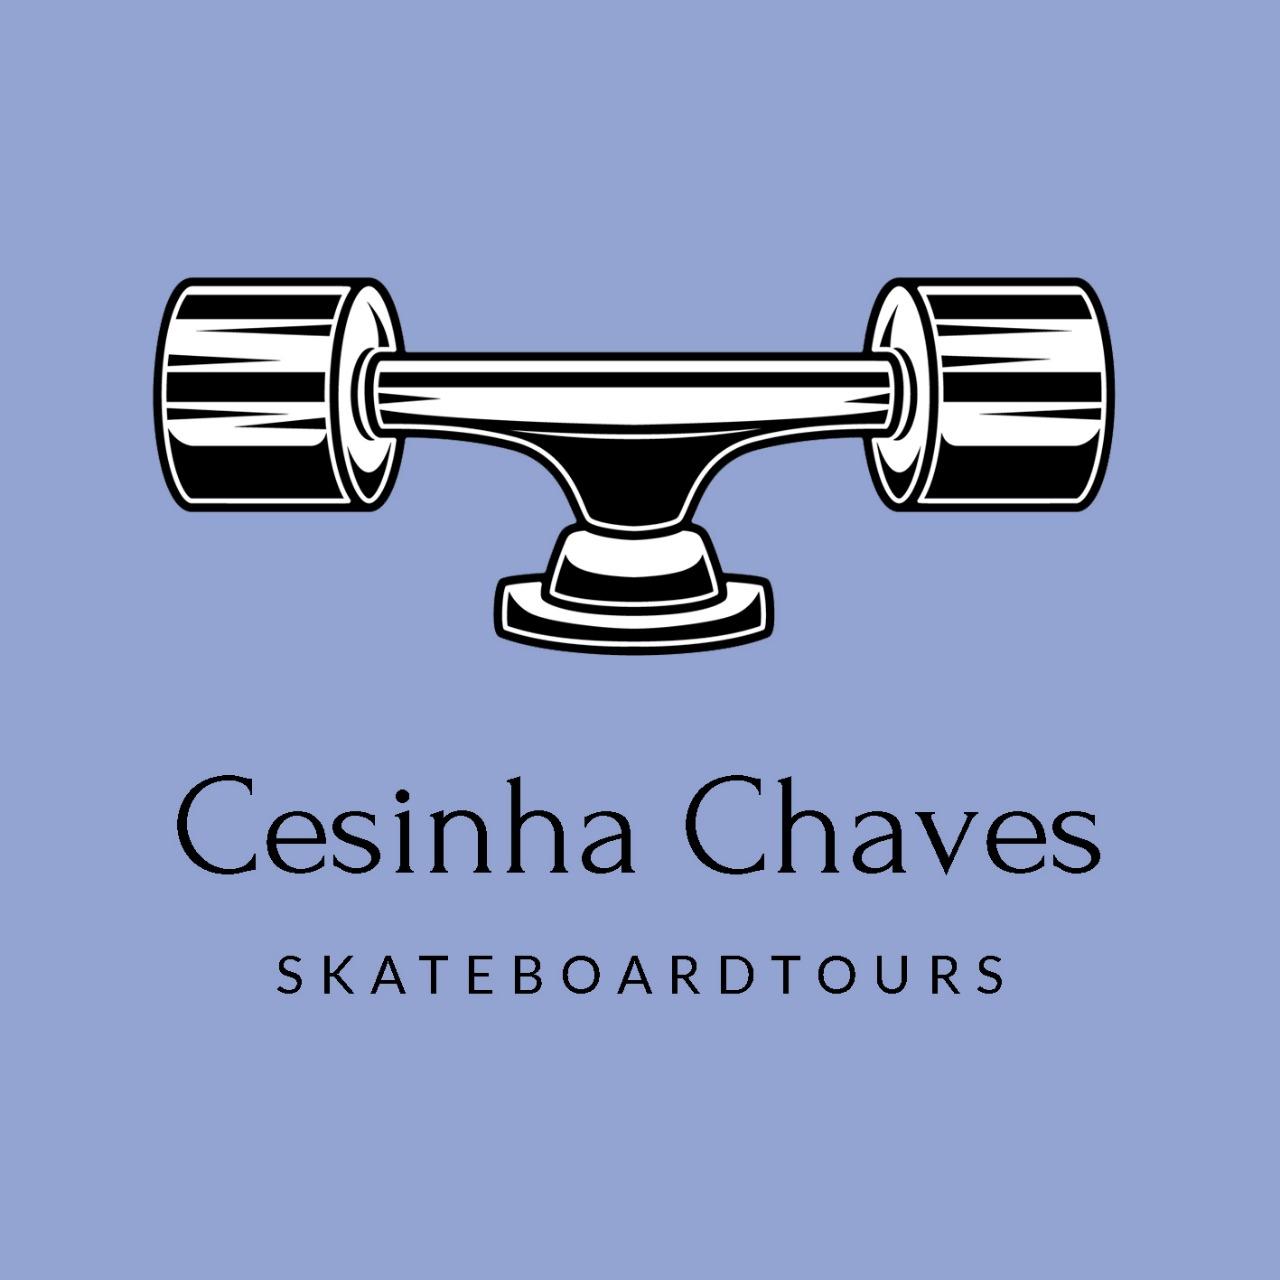 Cesinha Chaves Skateboard Tours